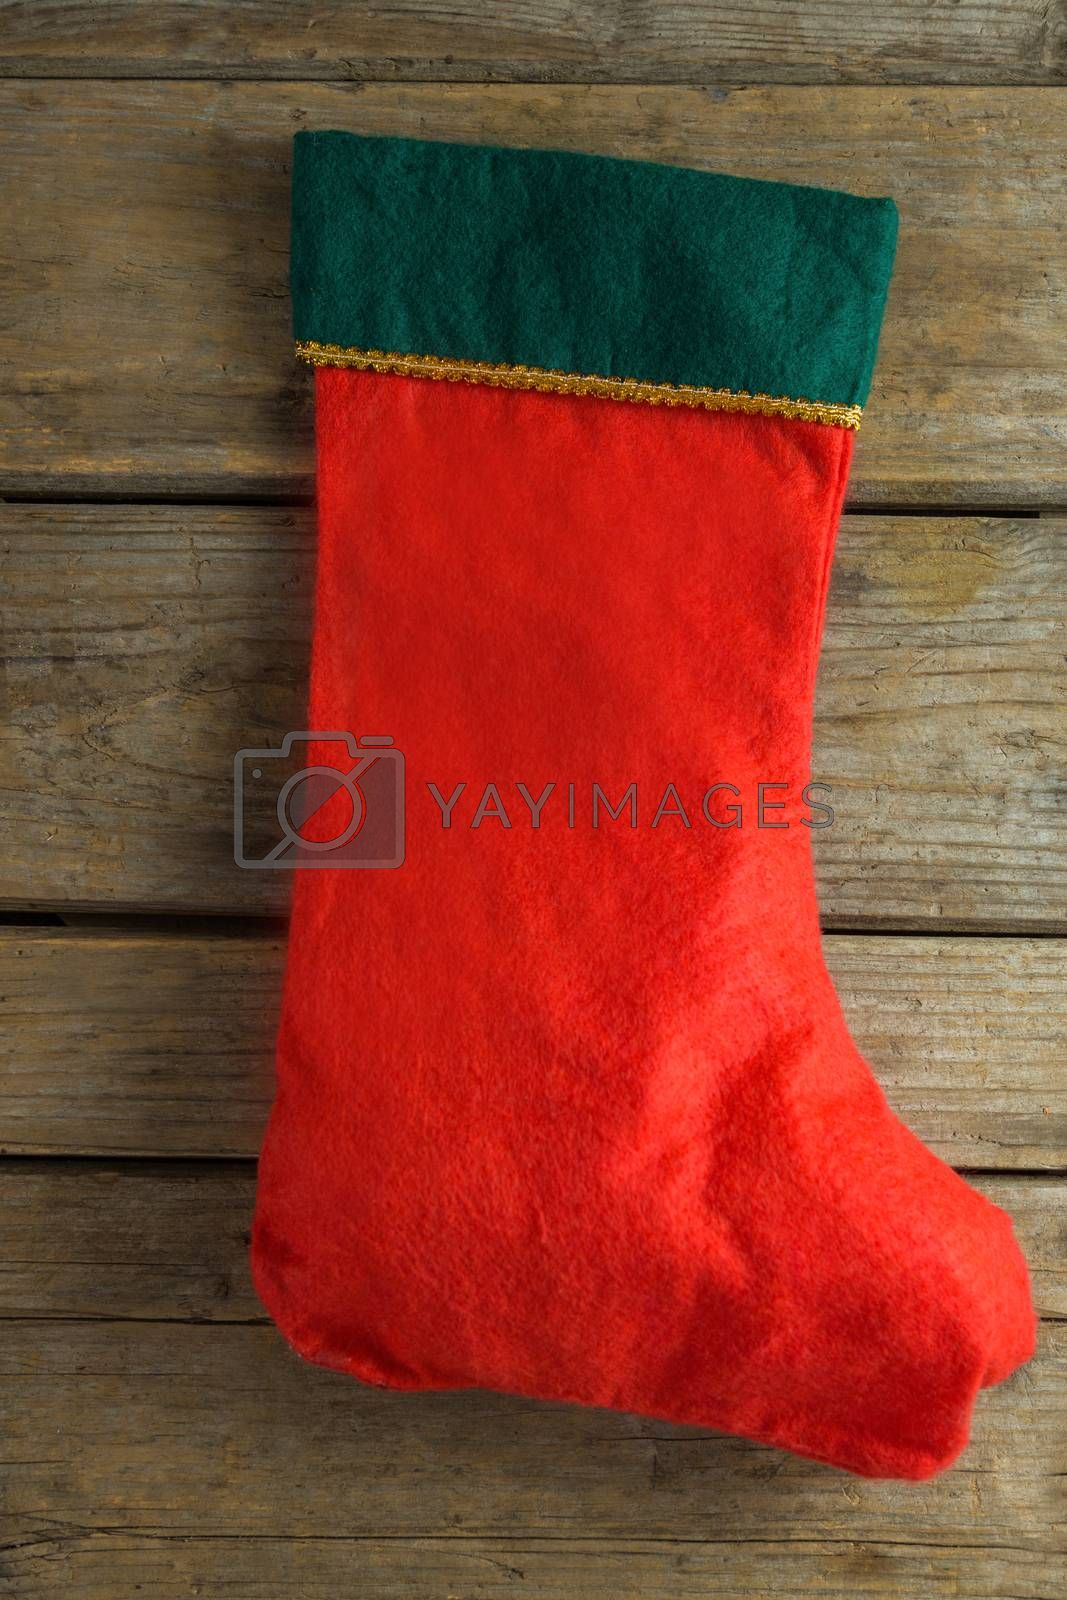 Christmas stocking on wooden plank by Wavebreakmedia